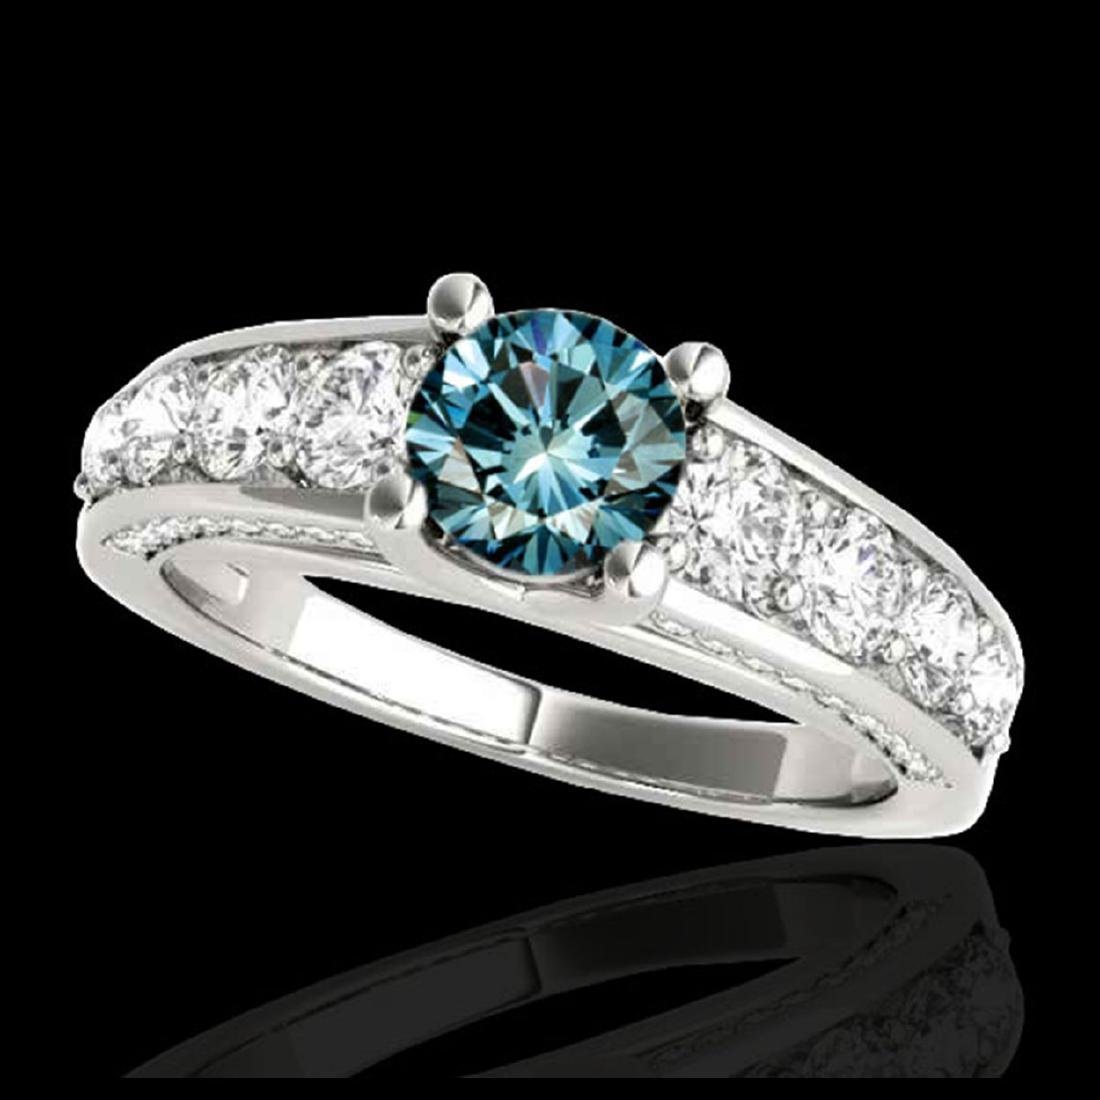 2.55 ctw SI Fancy Blue Diamond Solitaire Ring 10K White